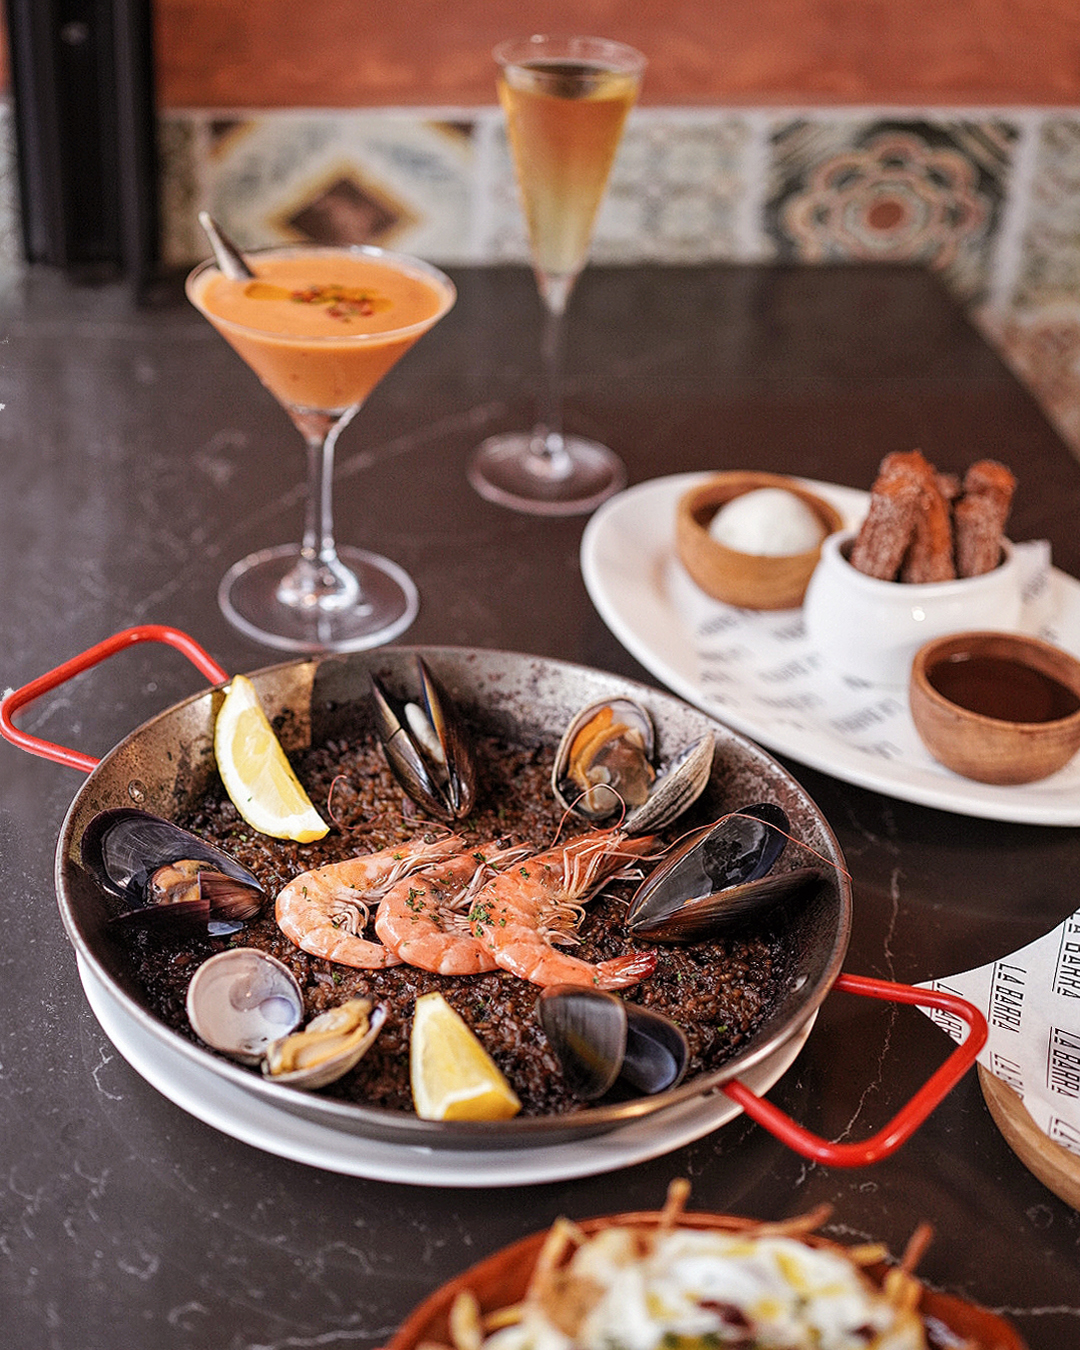 La Barra提供一系列地中海風味餐飲。